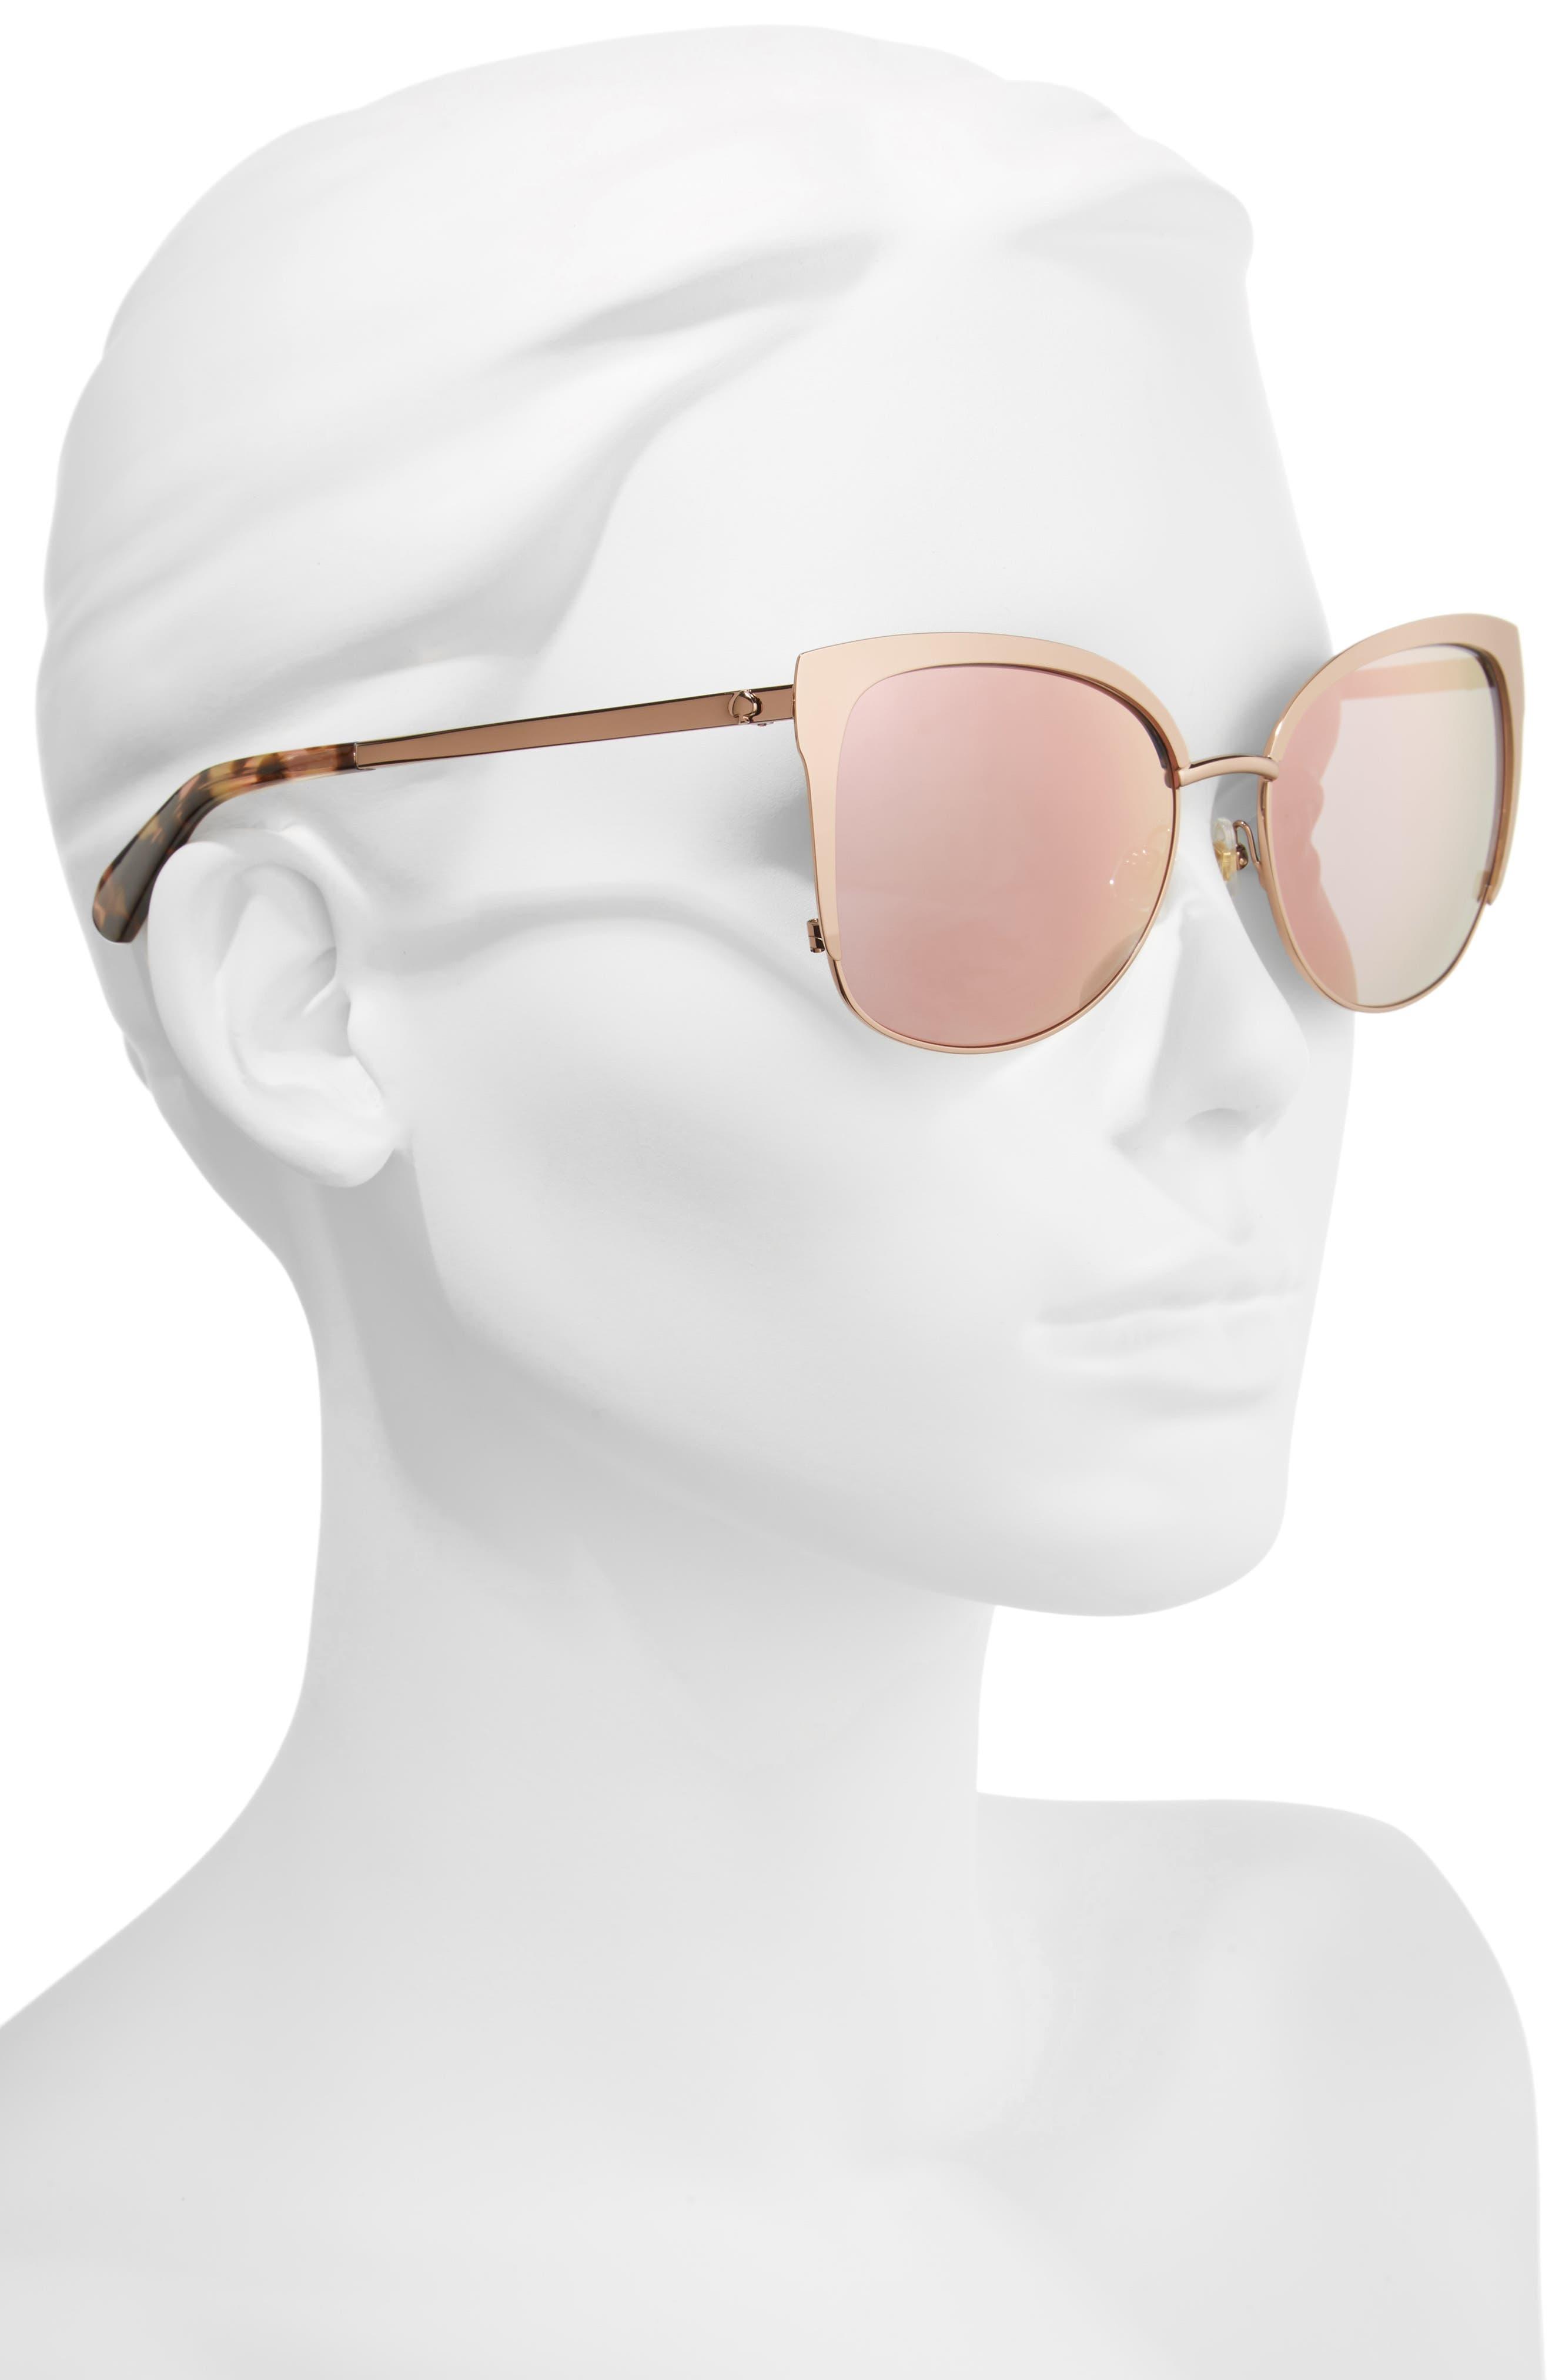 KATE SPADE NEW YORK, 'genice' 57mm cat-eye sunglasses, Alternate thumbnail 2, color, 710